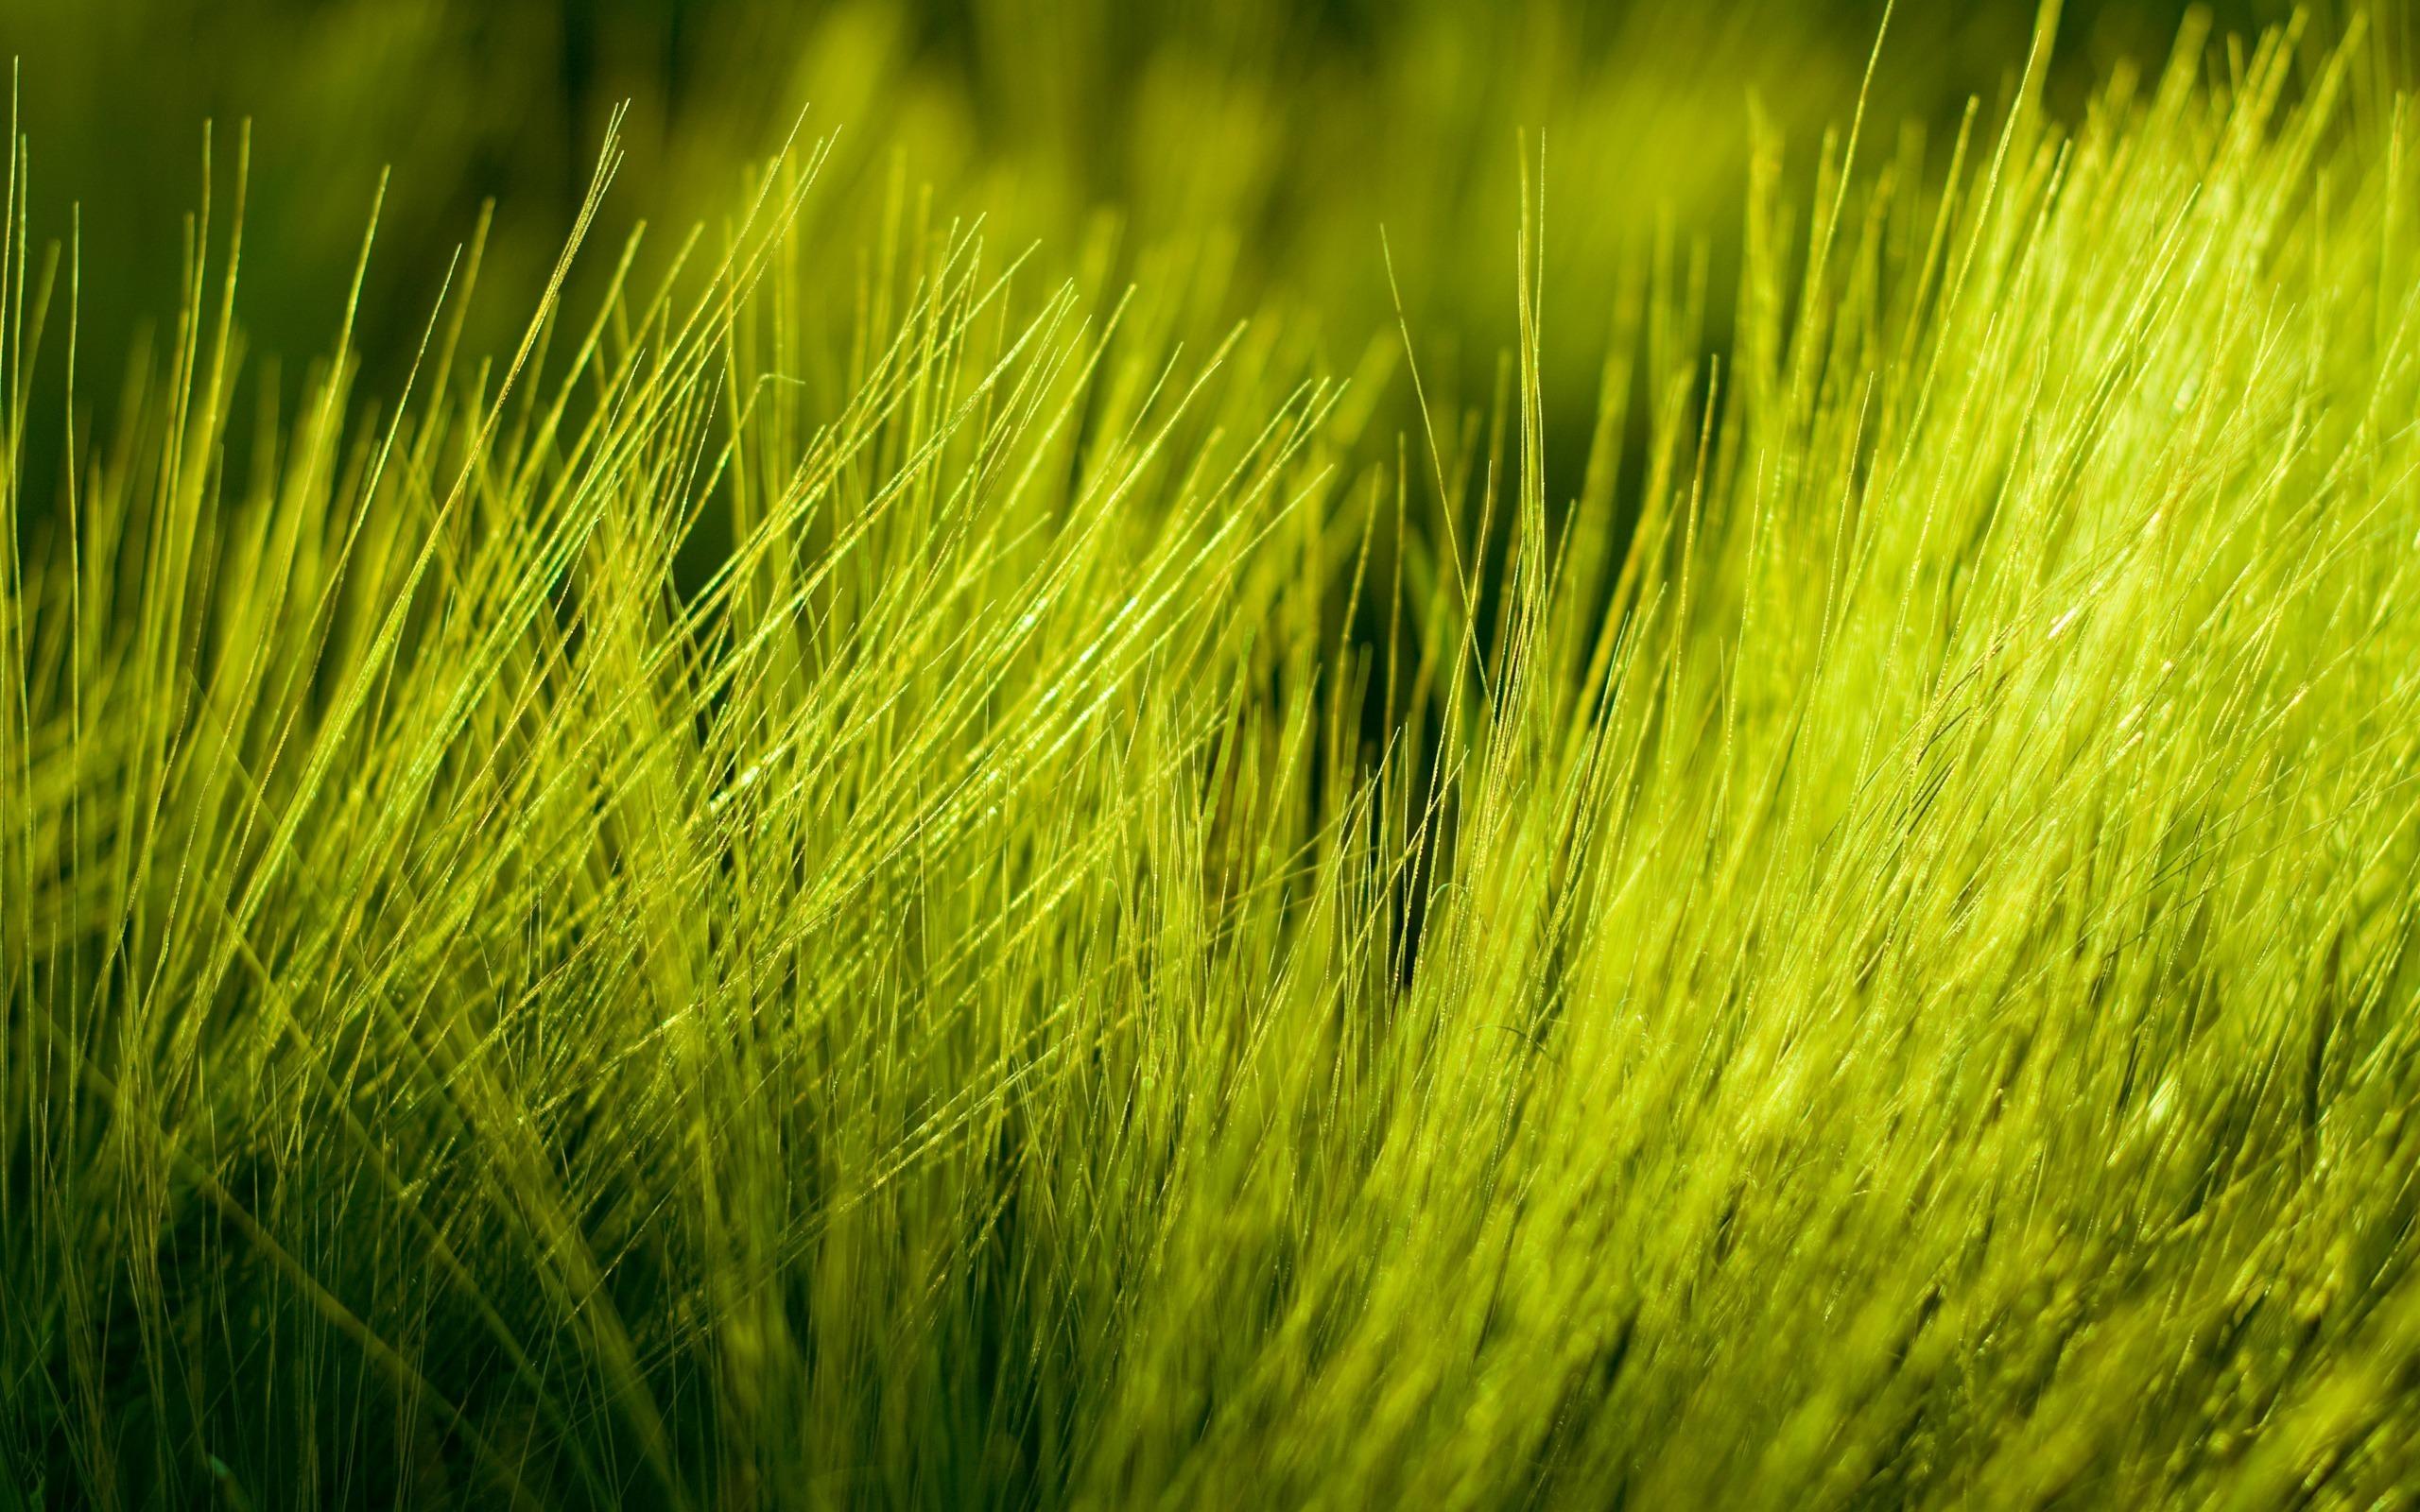 grass images computer